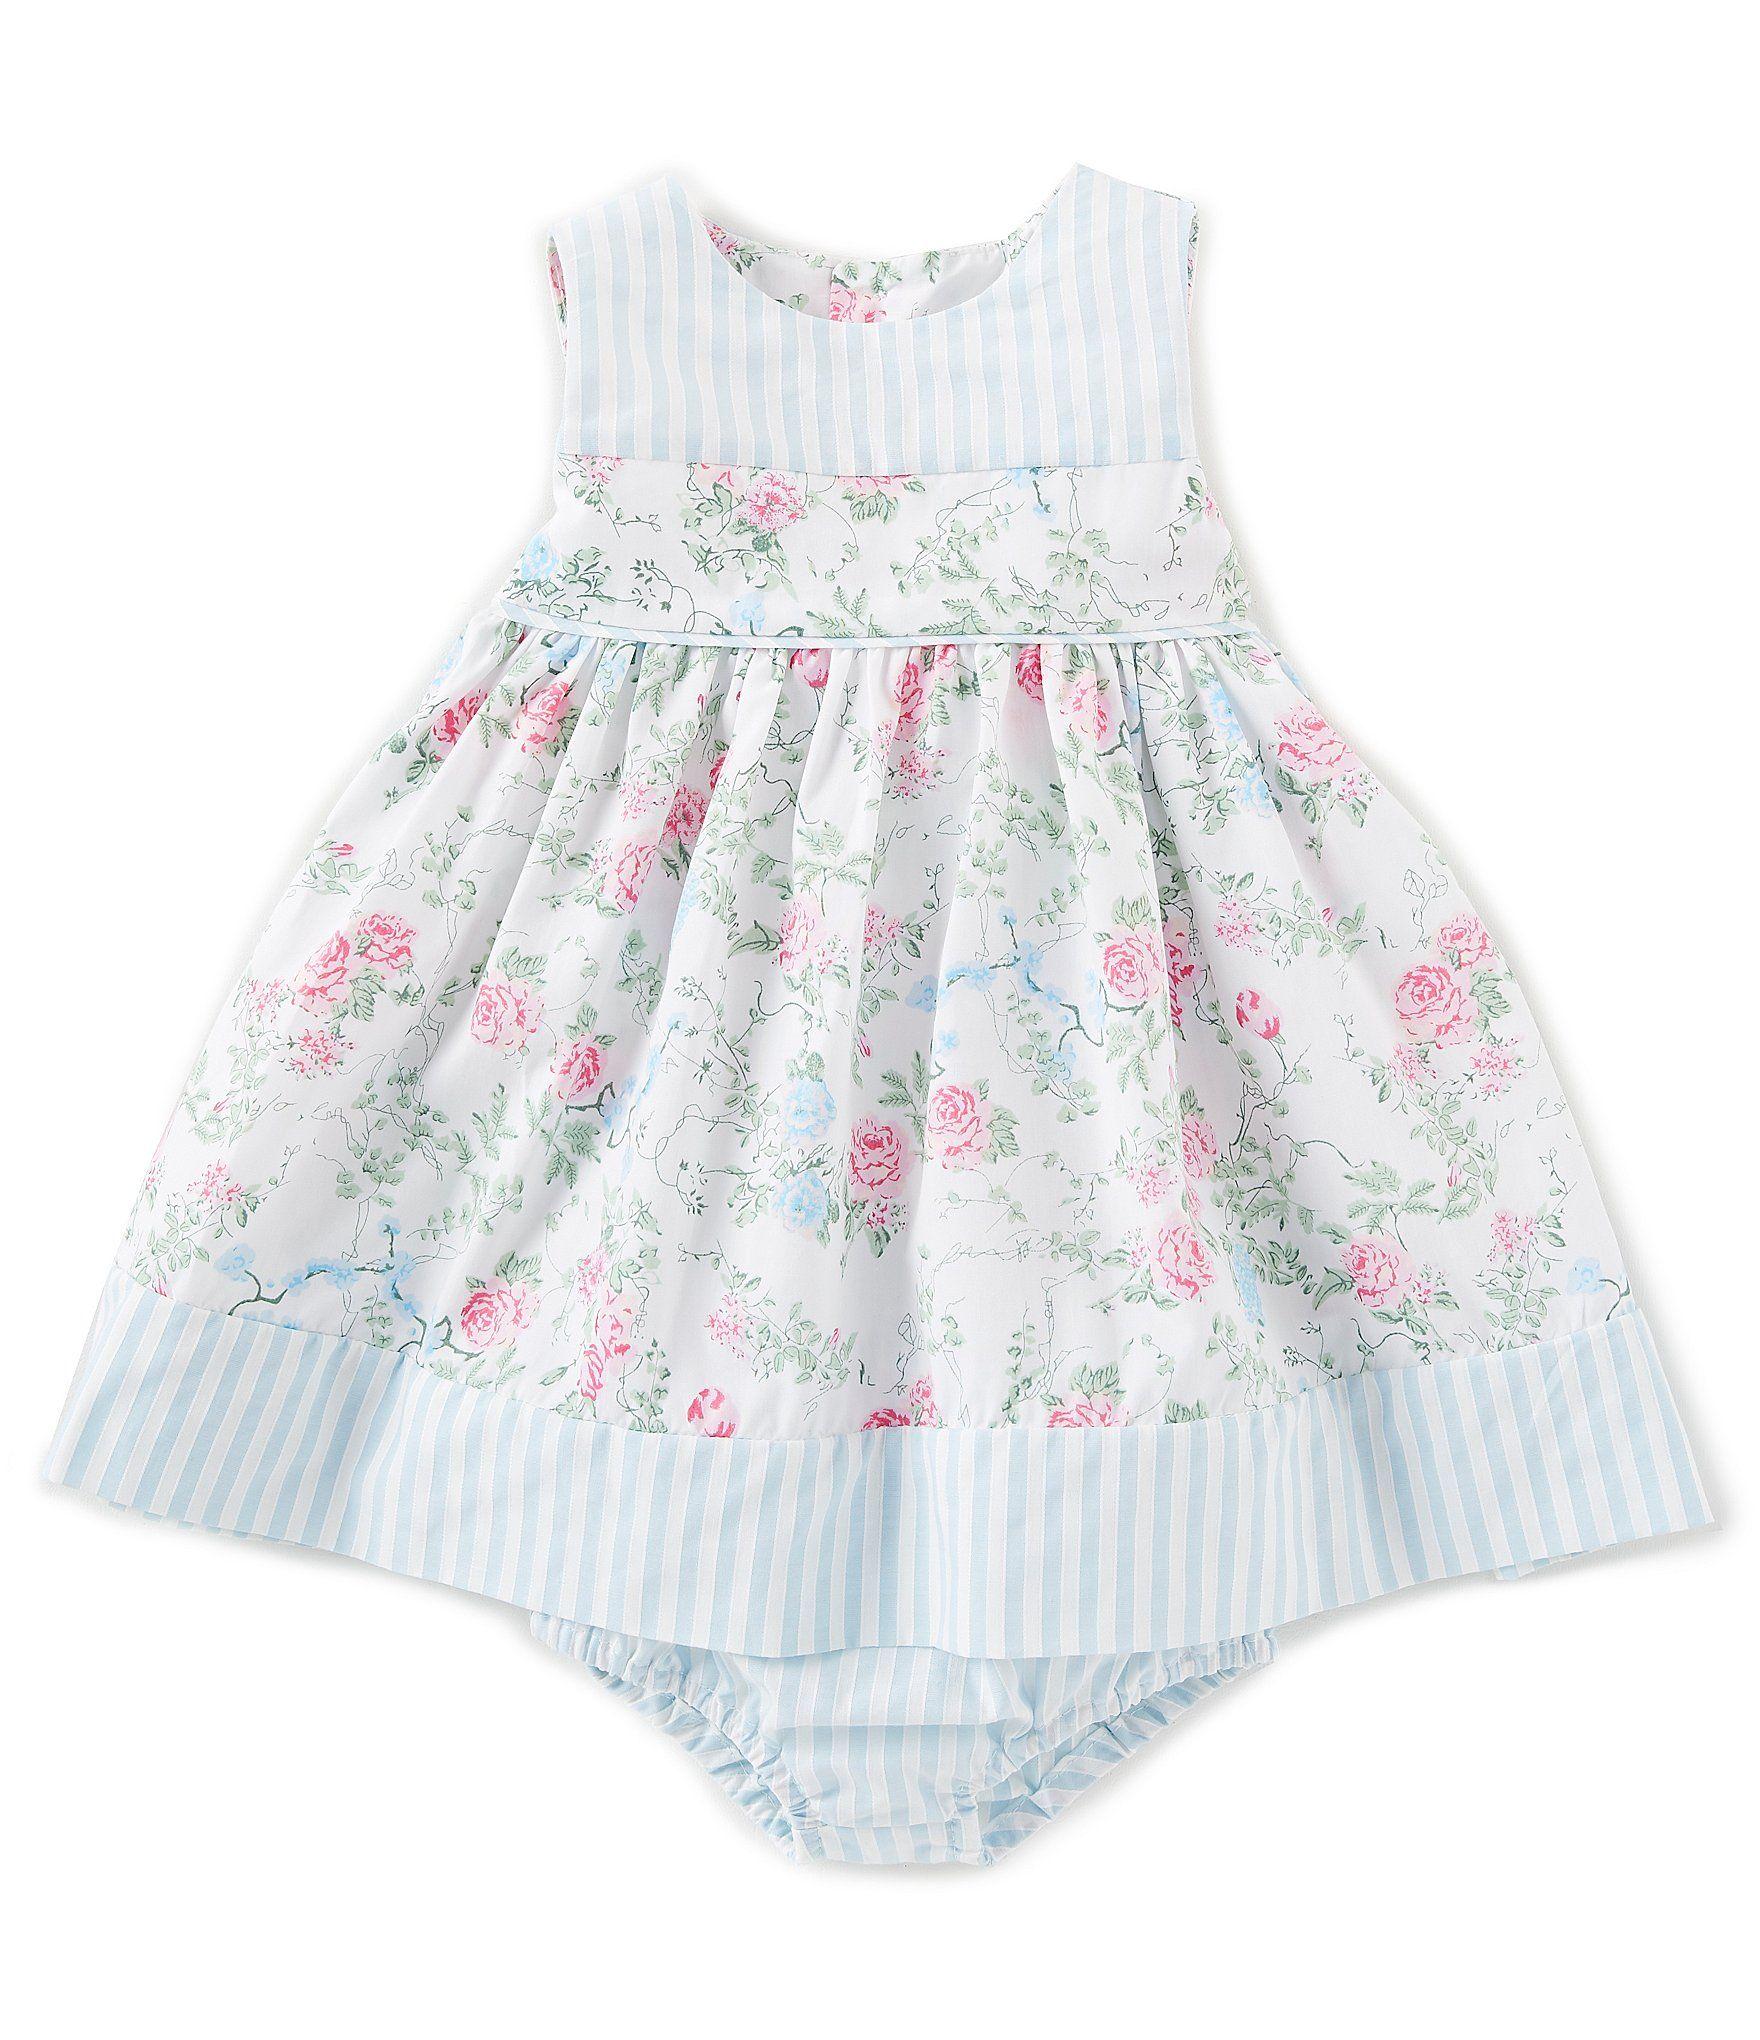 3ce78d9253 Edgehill Collection Baby Girls 3-24 Months Floral Stripe A-Line Dress